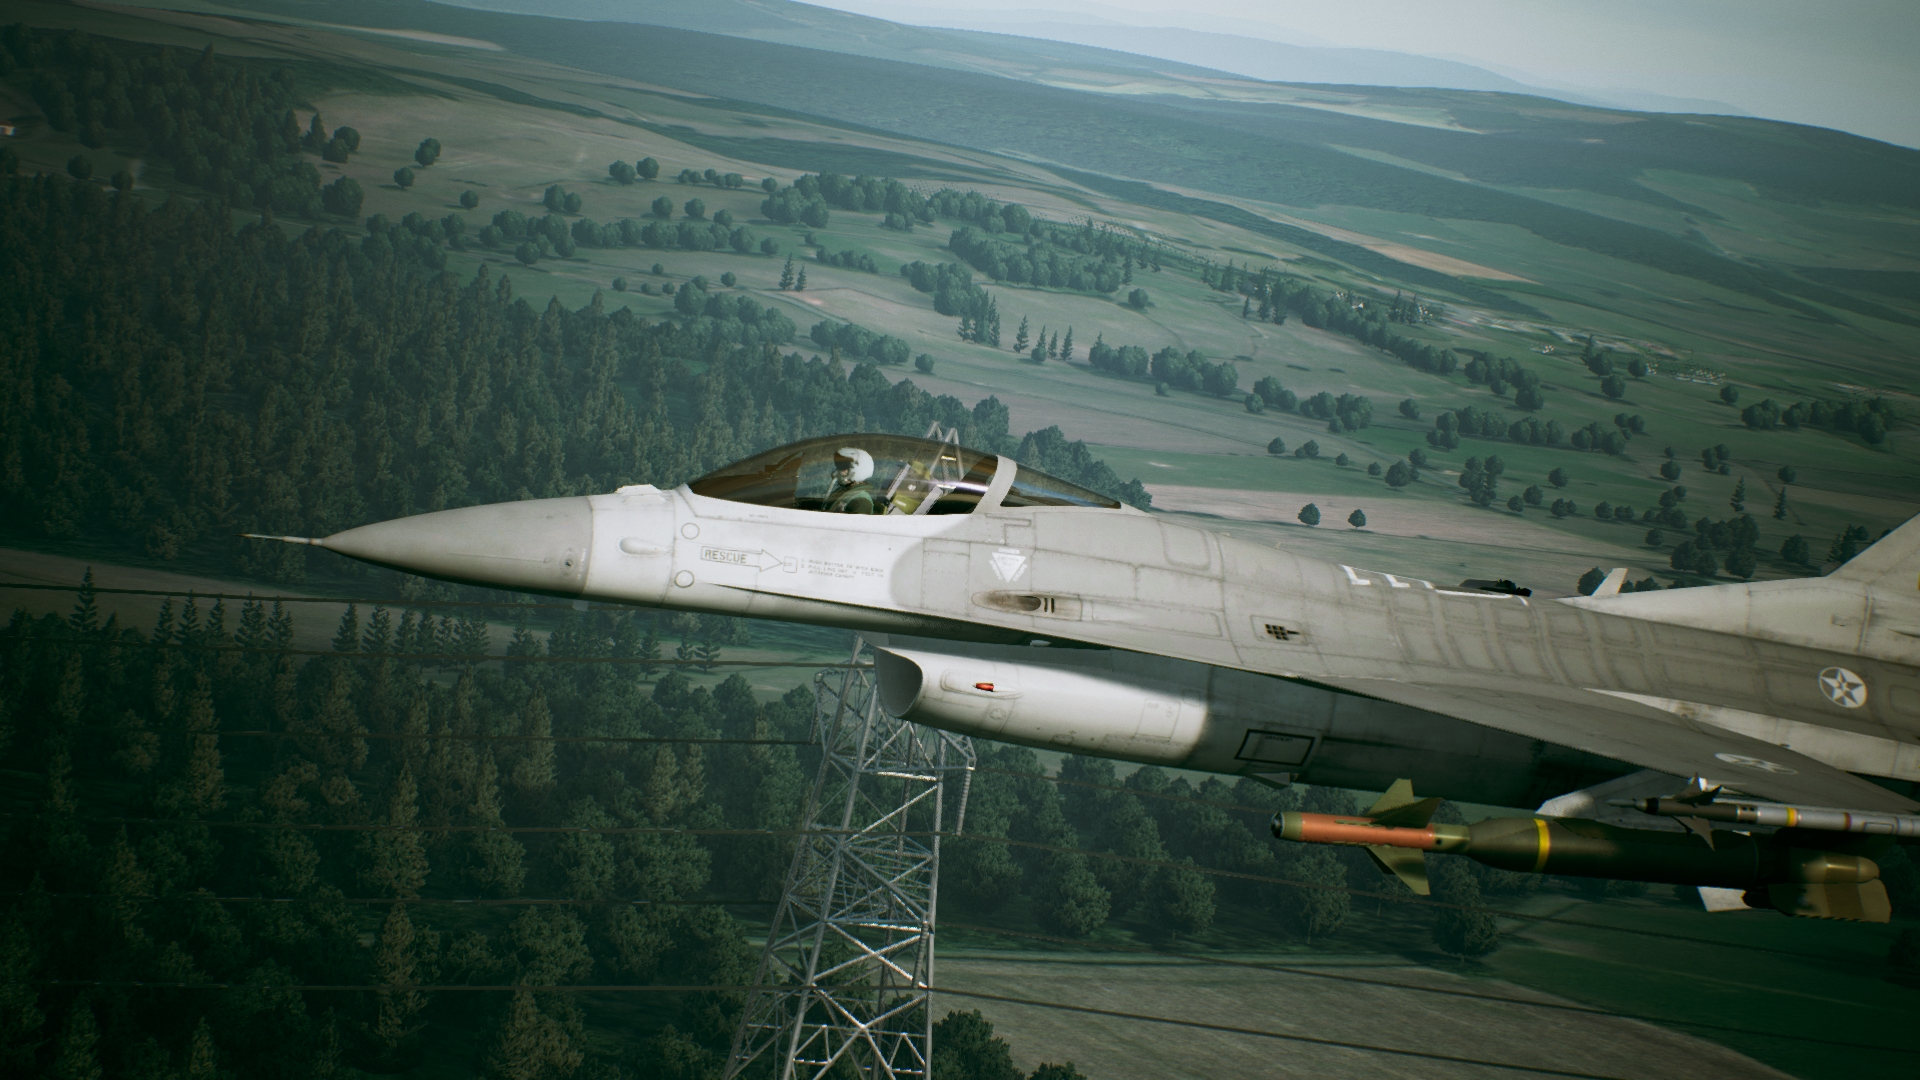 Black Ops 3 Wallpaper Ace Combat 7 Has Biggest Uk Launch In Series History